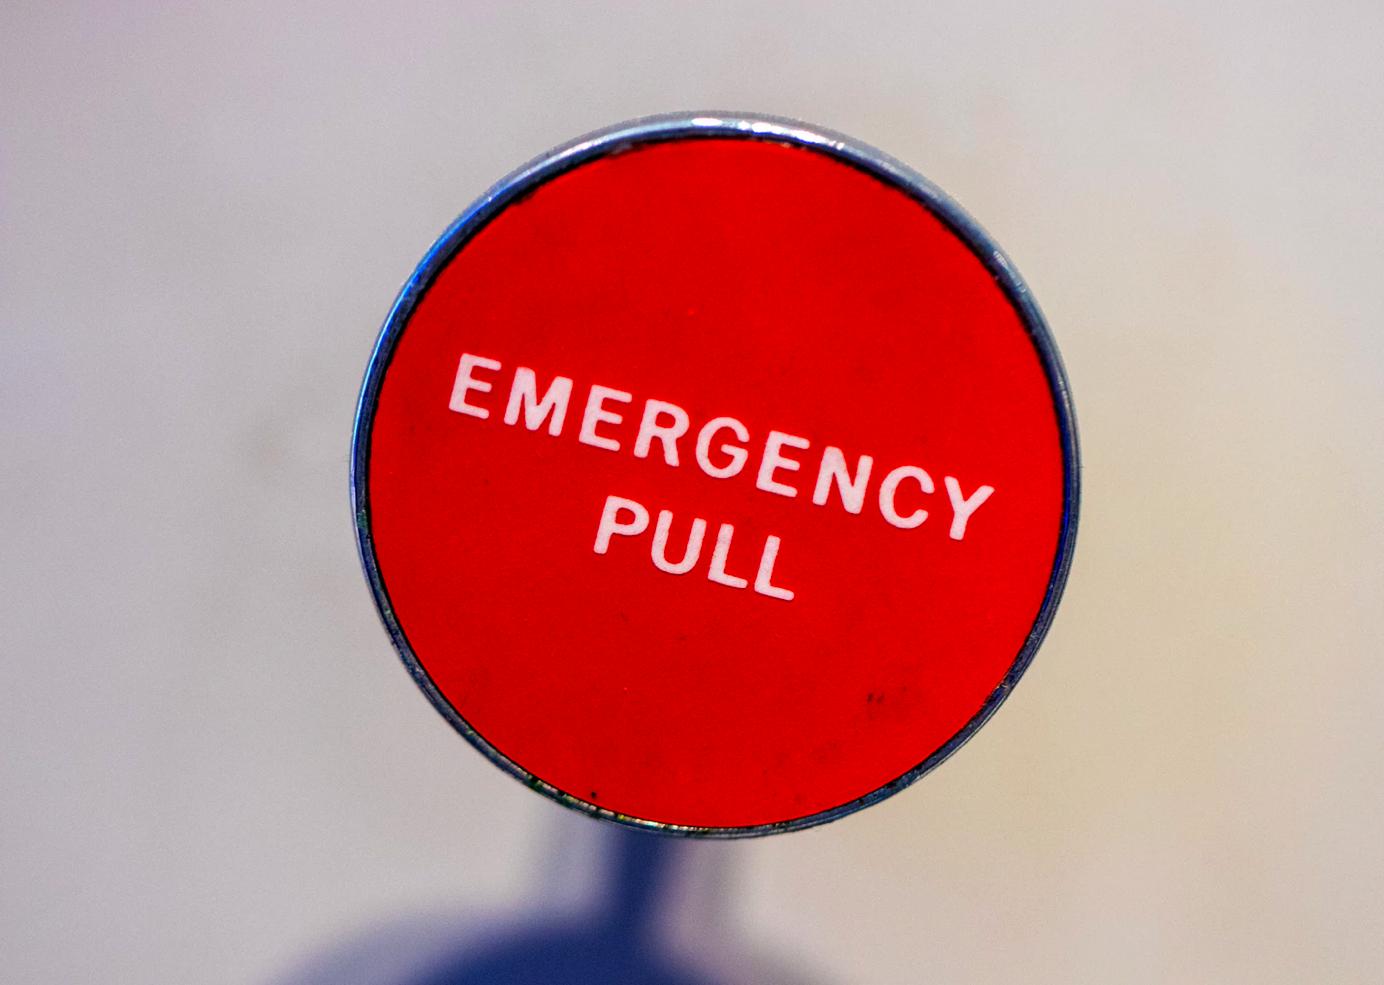 emergency pull